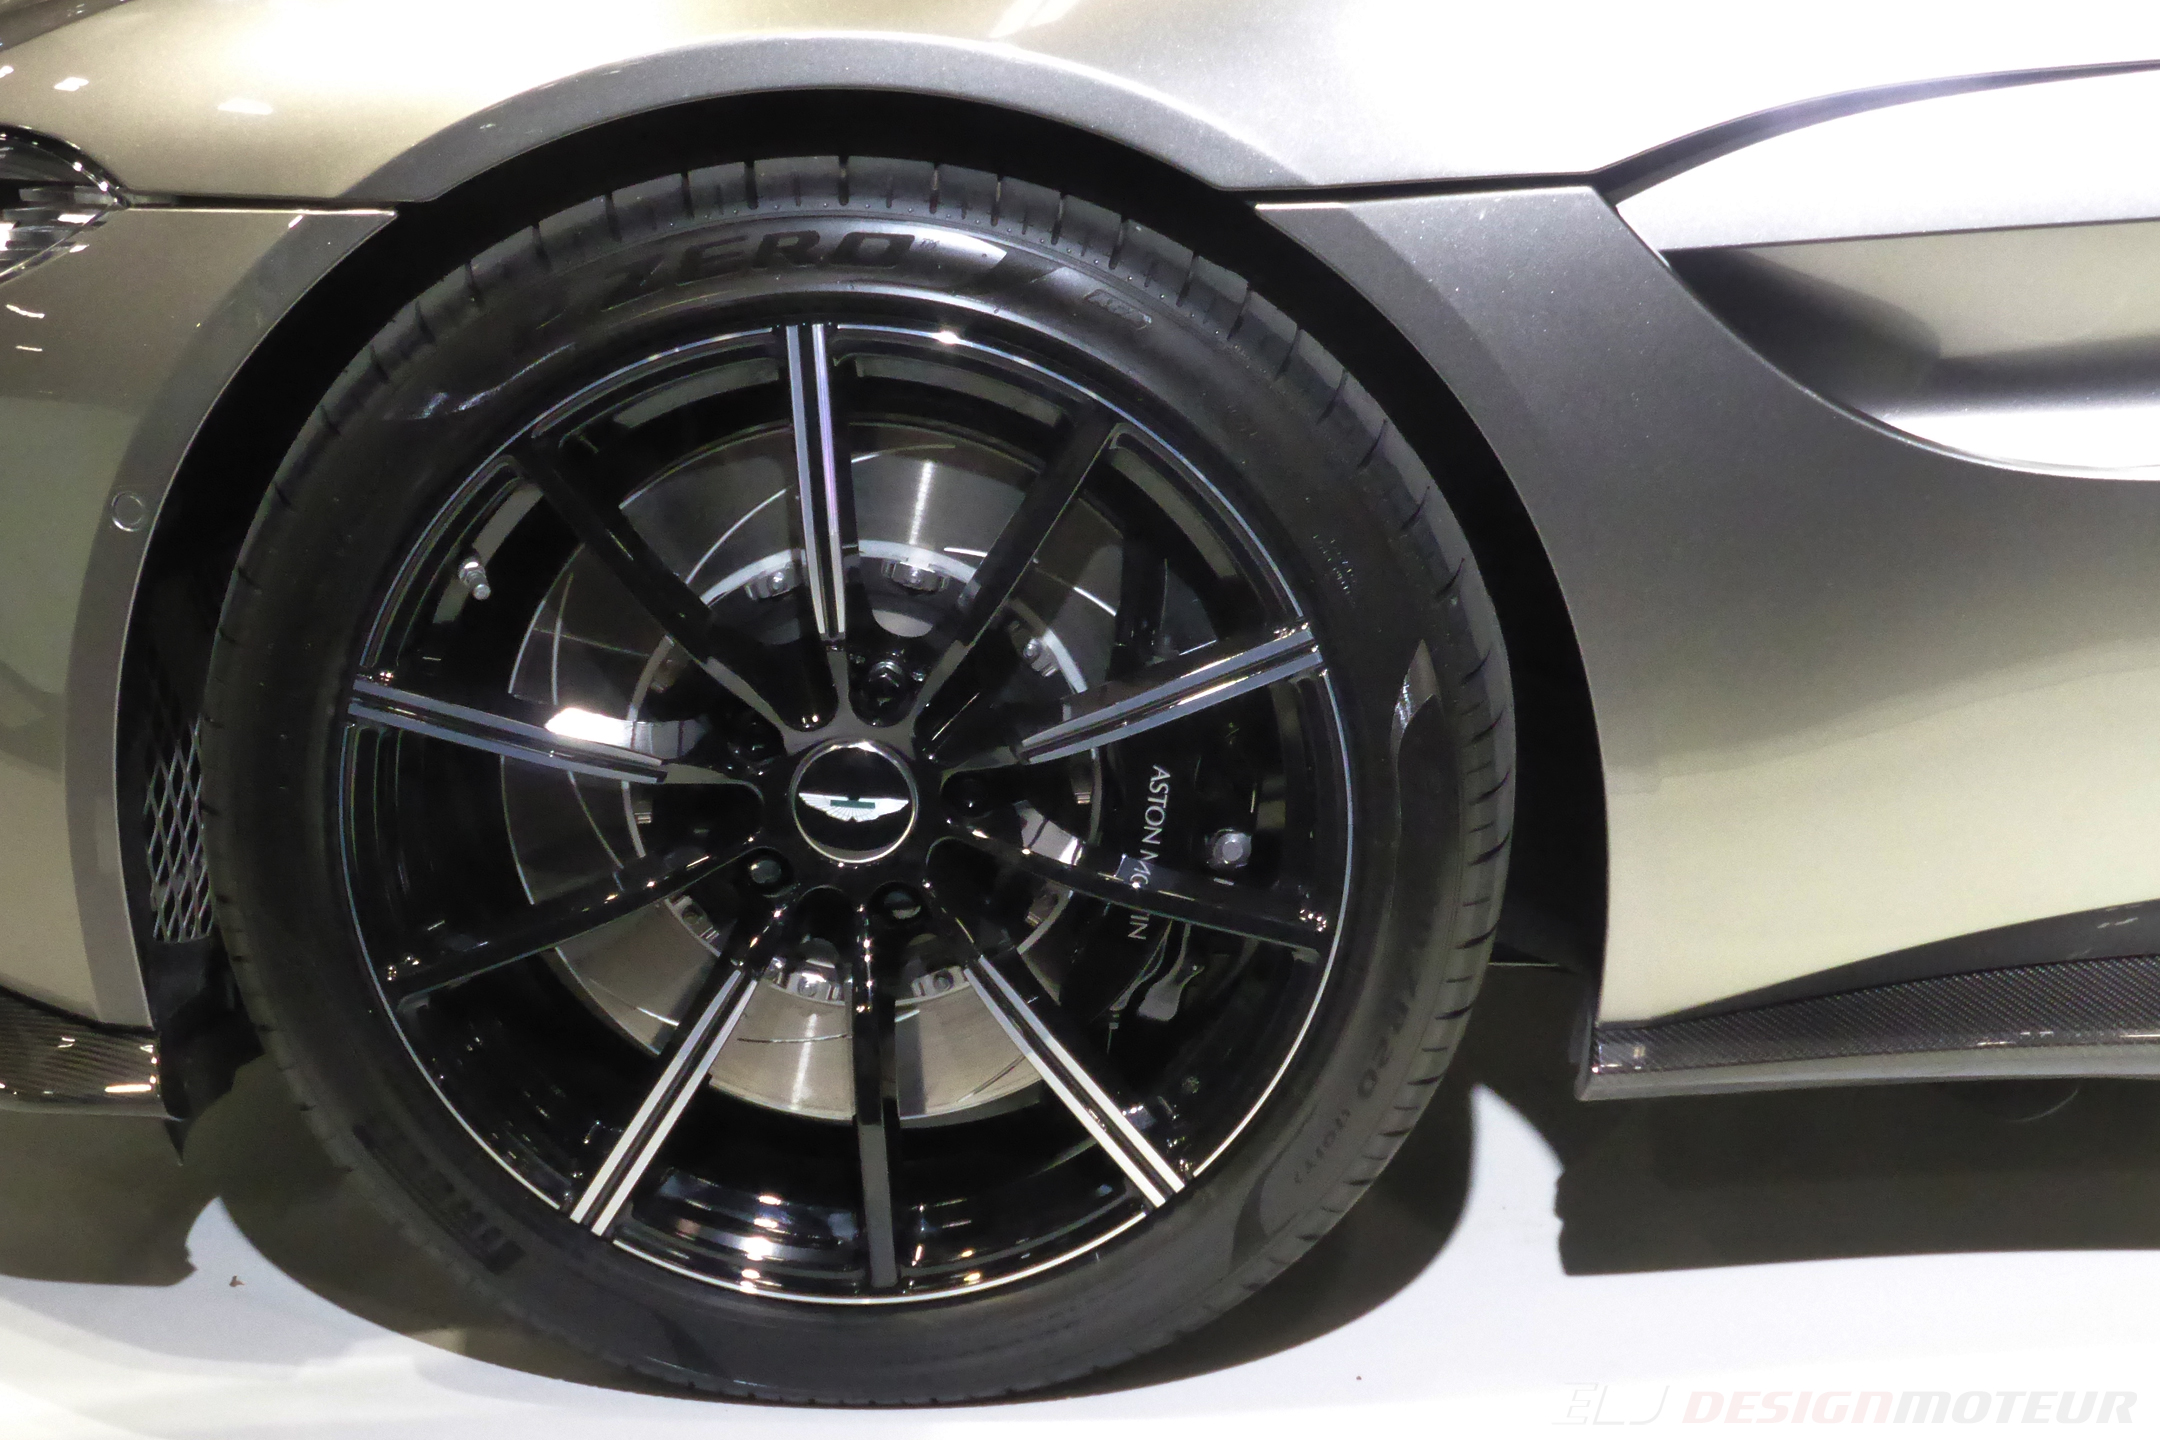 Aston Martin Vantage - front wheel - Paris Motor Show - 2018 - Mondial Auto - photo ELJ DESIGNMOTEUR